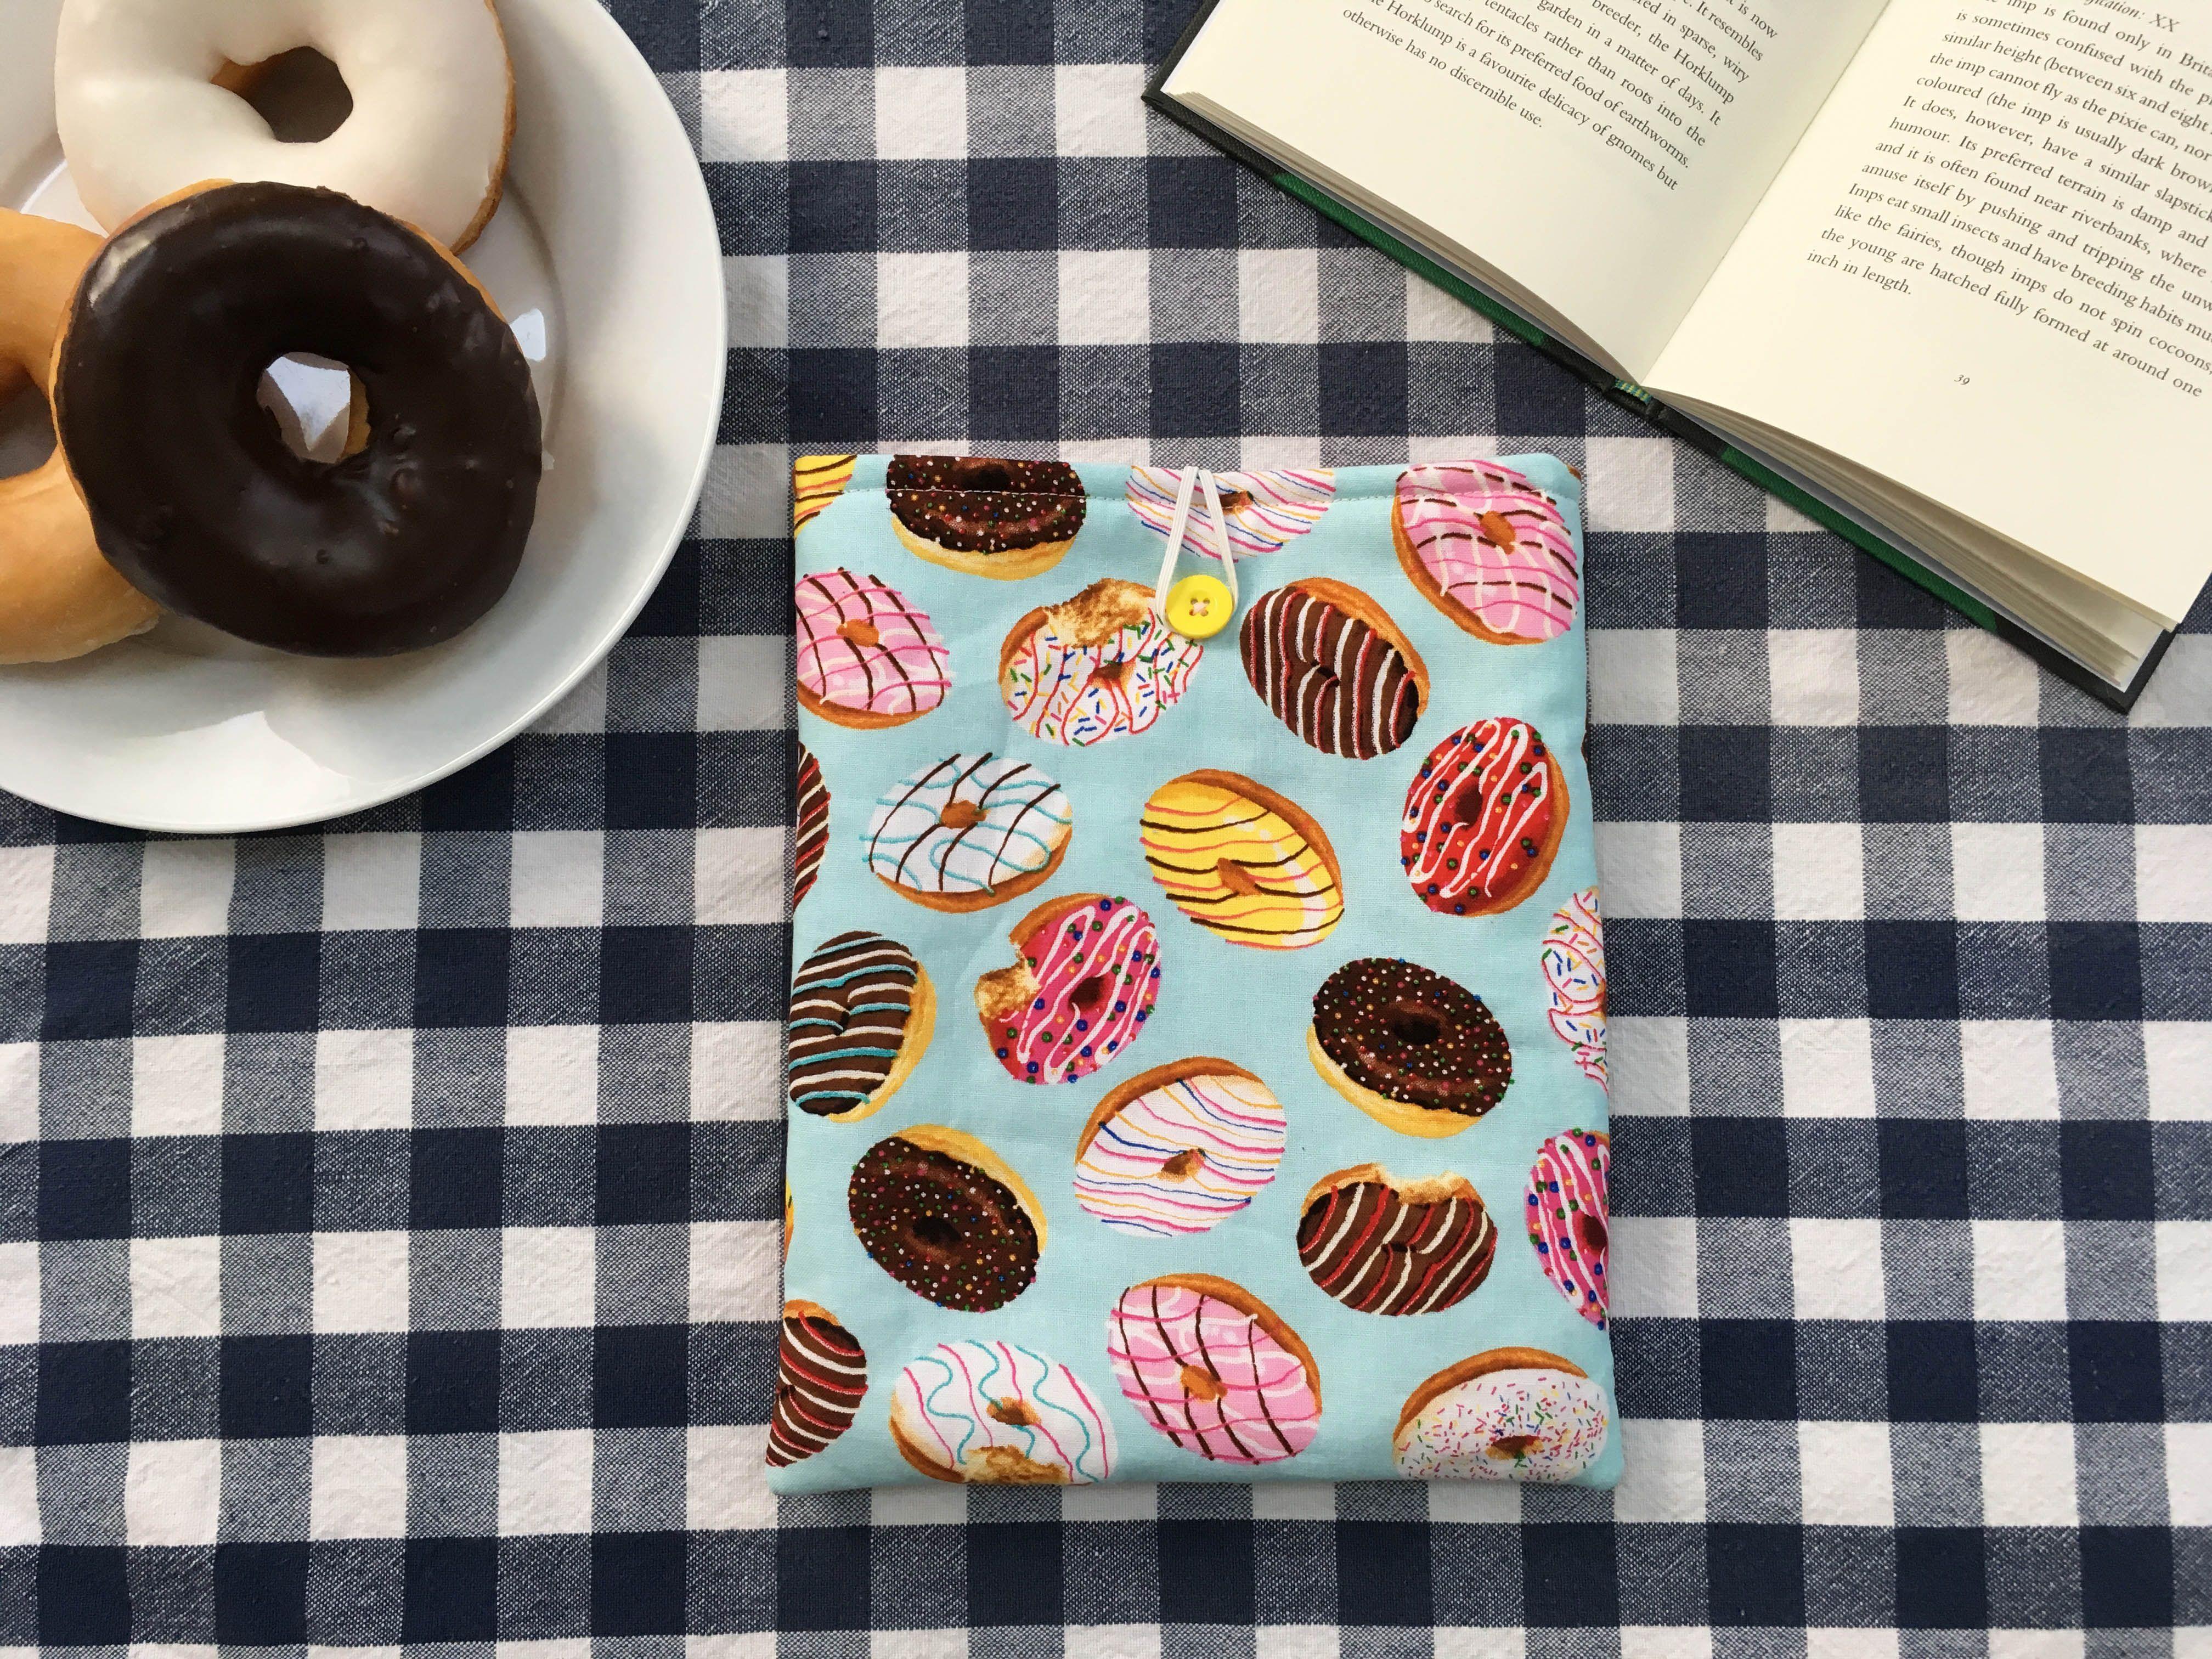 Doughnut Book Sleeve Handmade Book Cover on Etsy! Sew